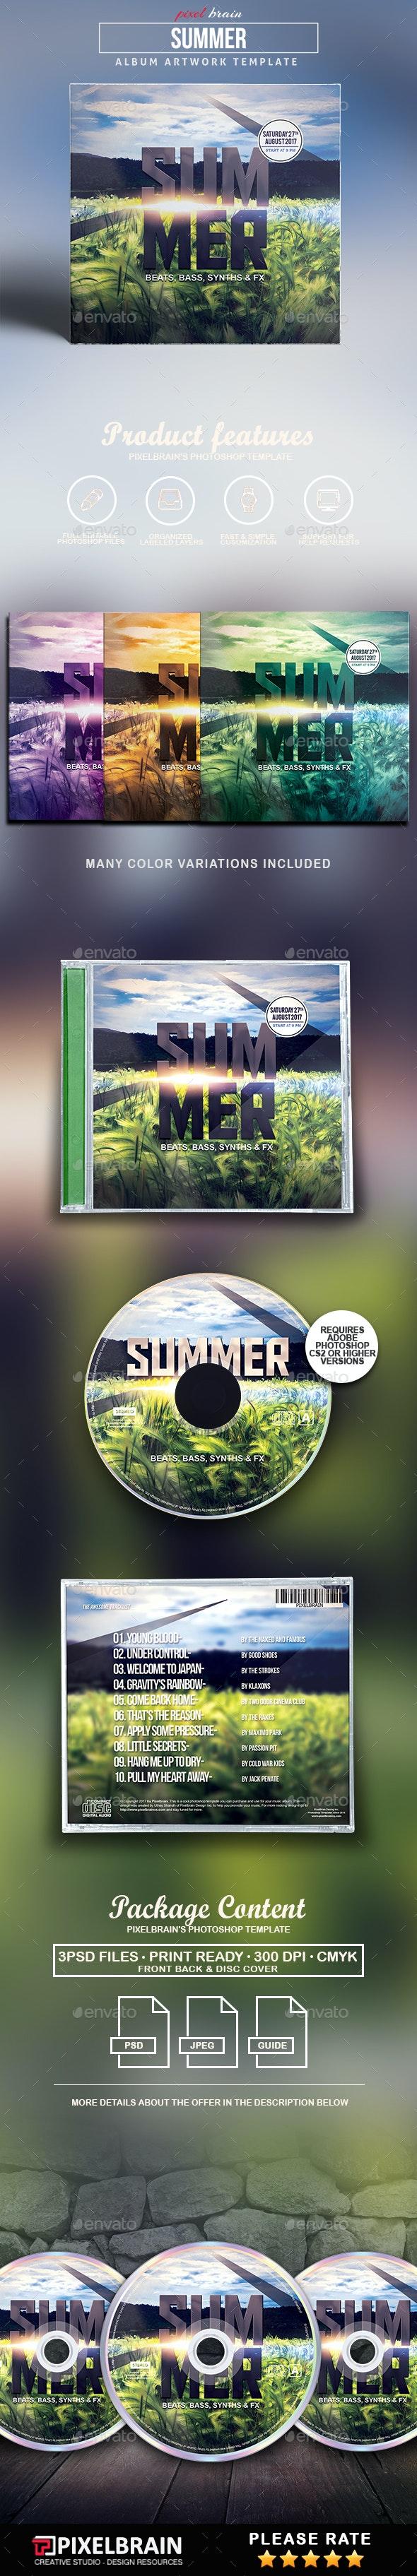 Summer CD Cover Artwork - CD & DVD Artwork Print Templates